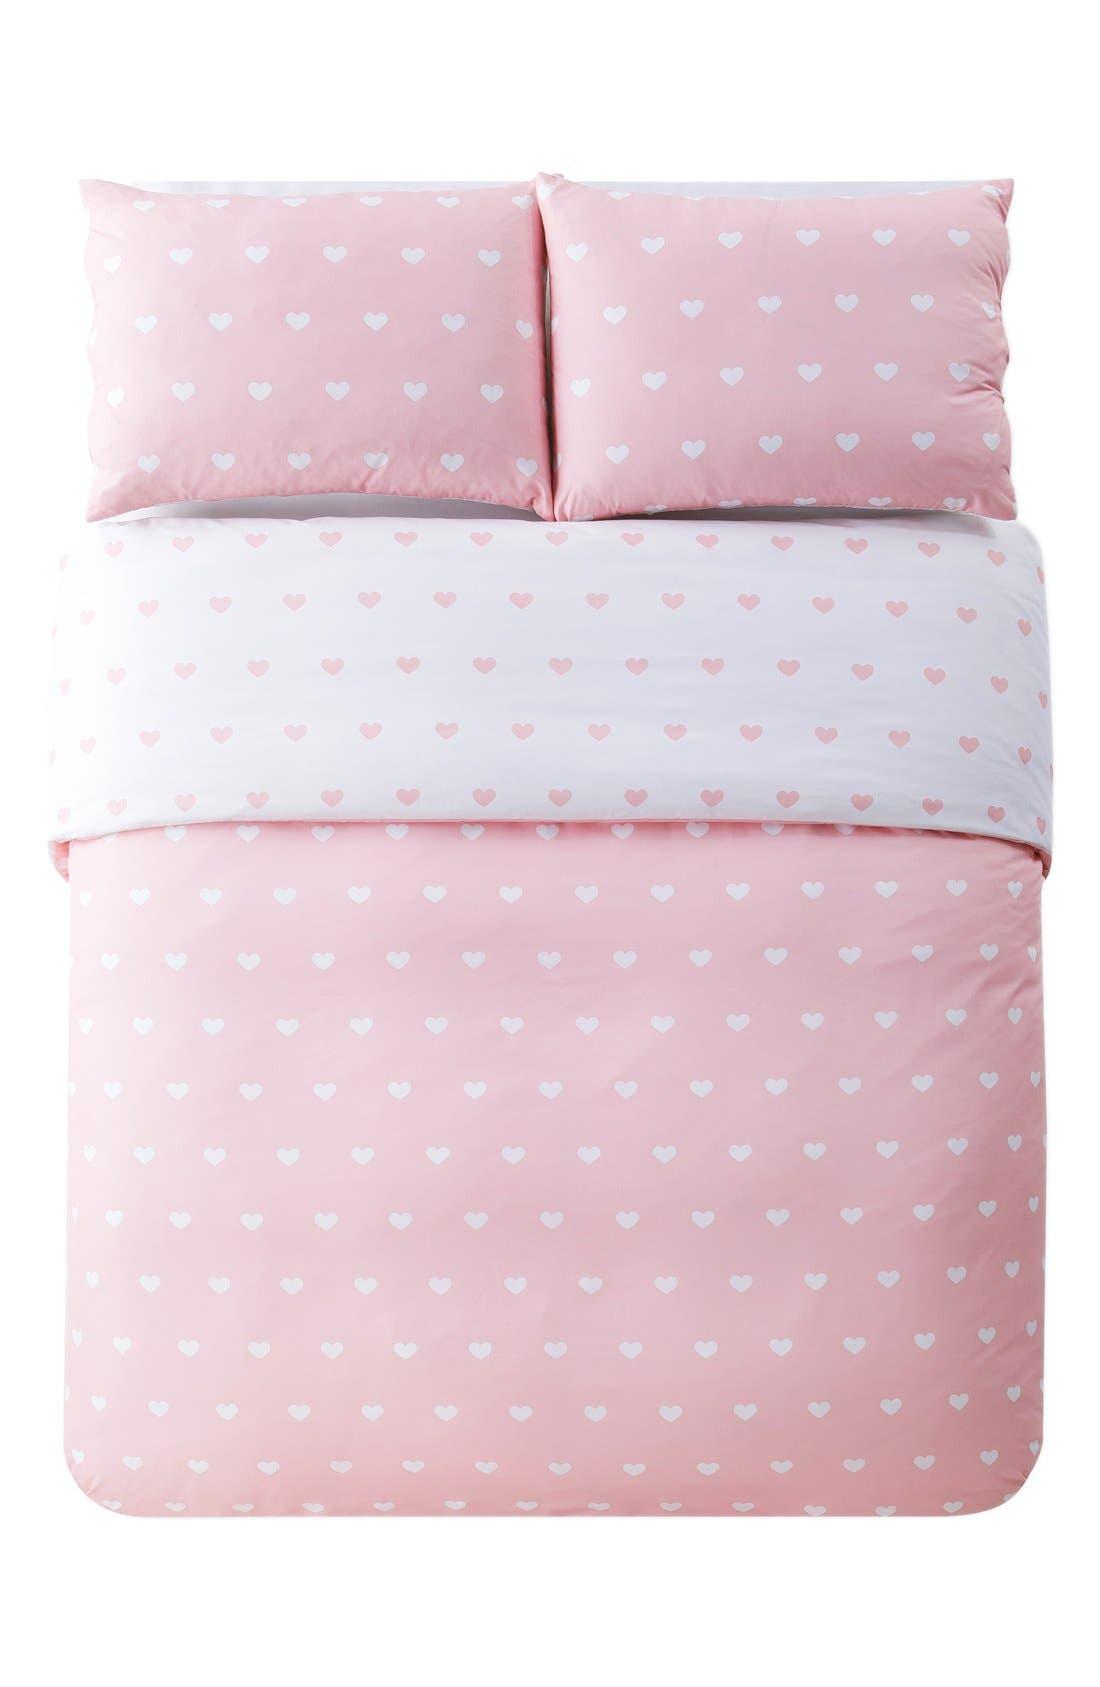 Alternate Image 1 Selected - LALA + BASH 'Kelly' Heart Print Comforter Set